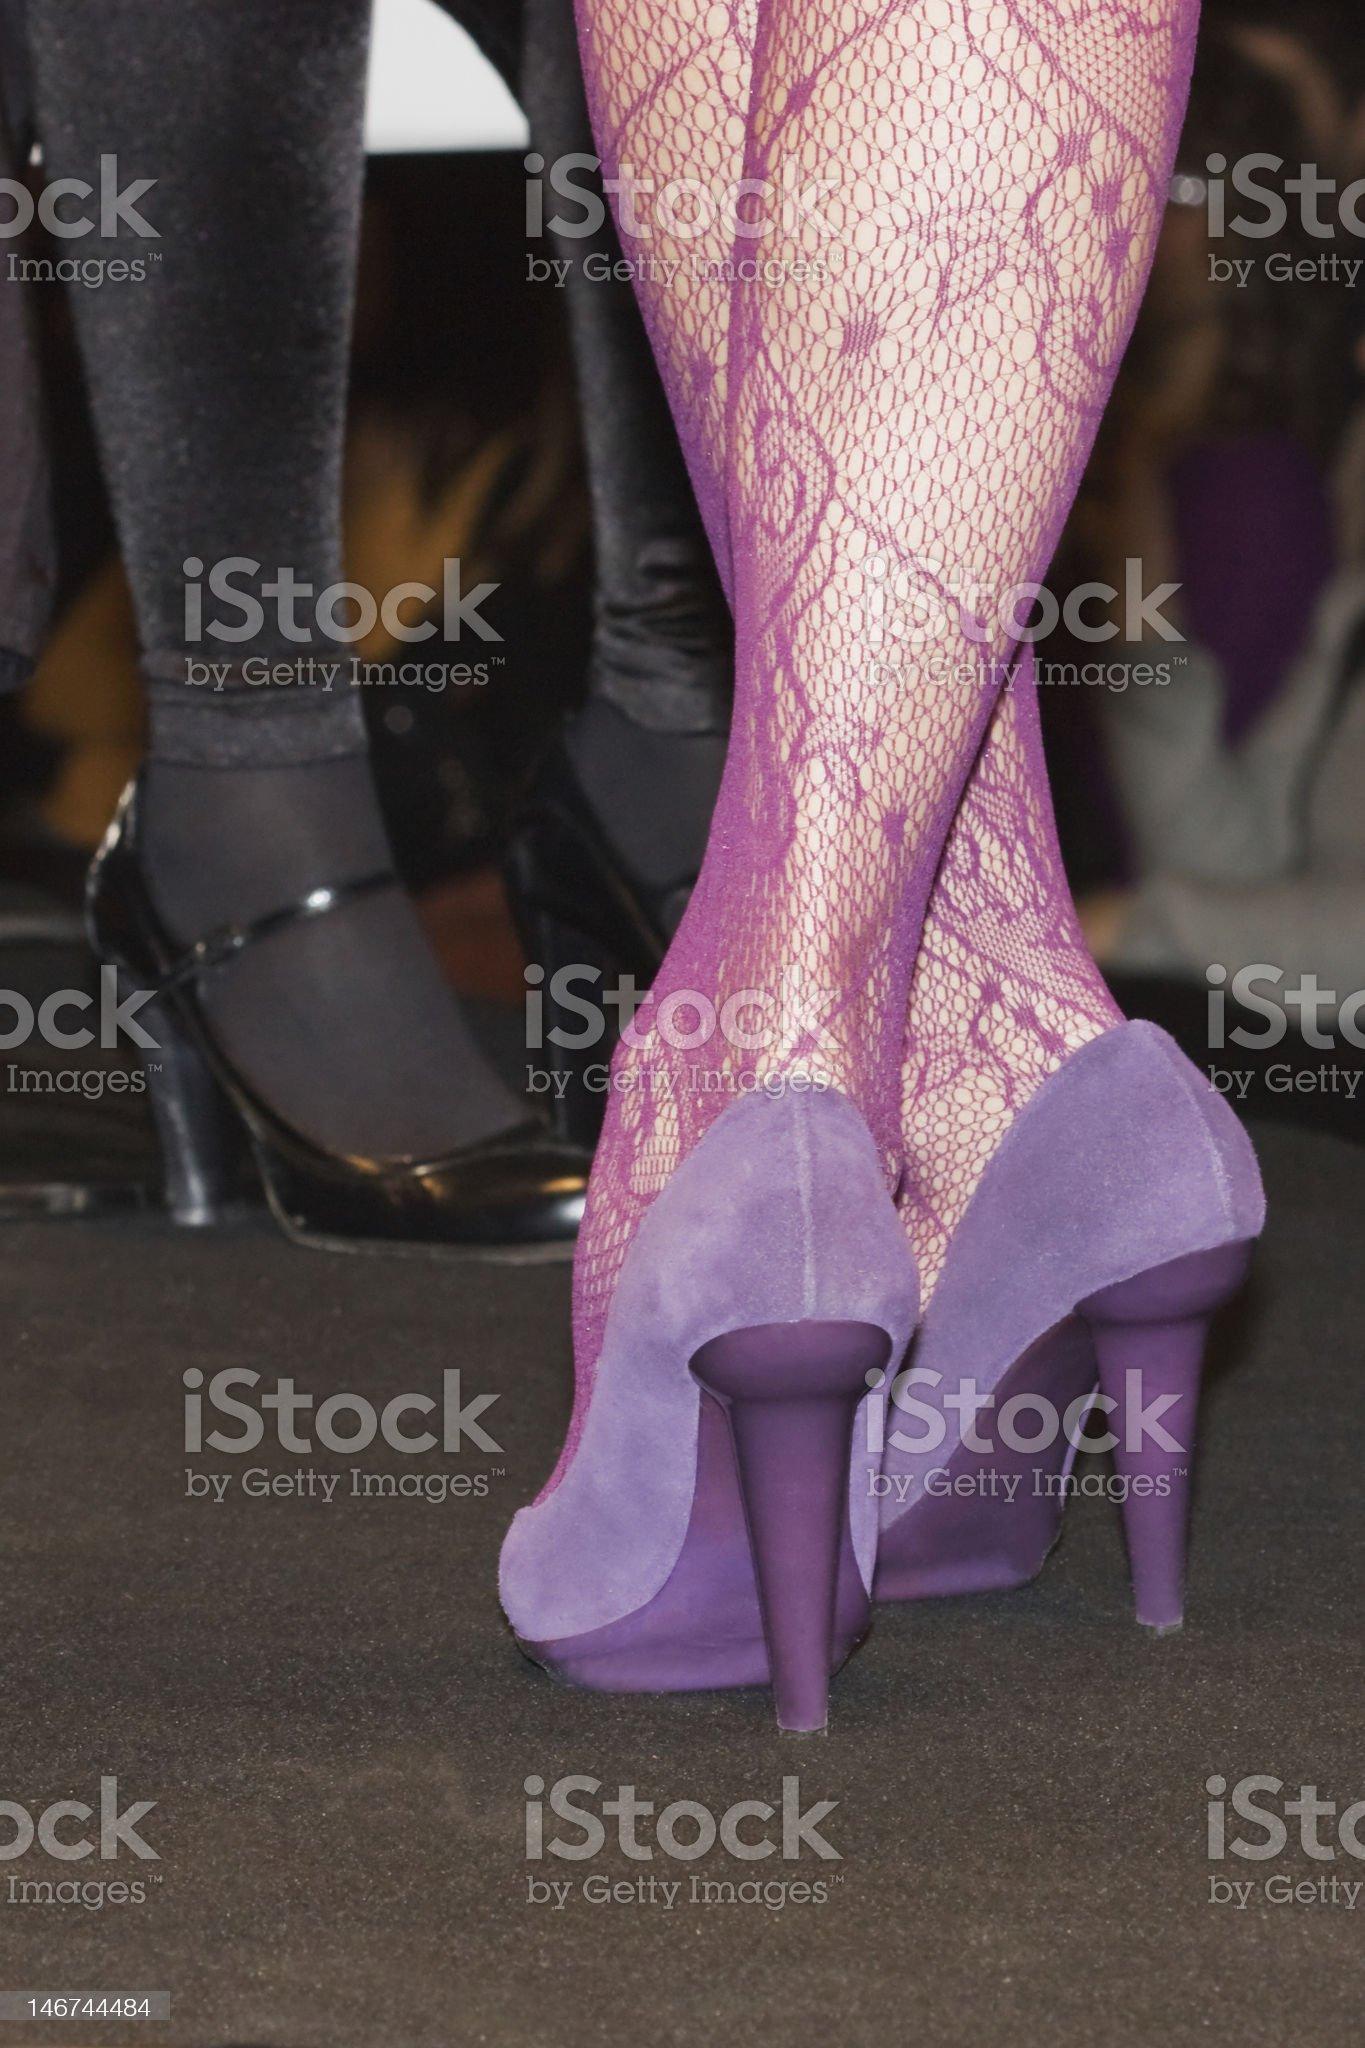 Crossed legs royalty-free stock photo